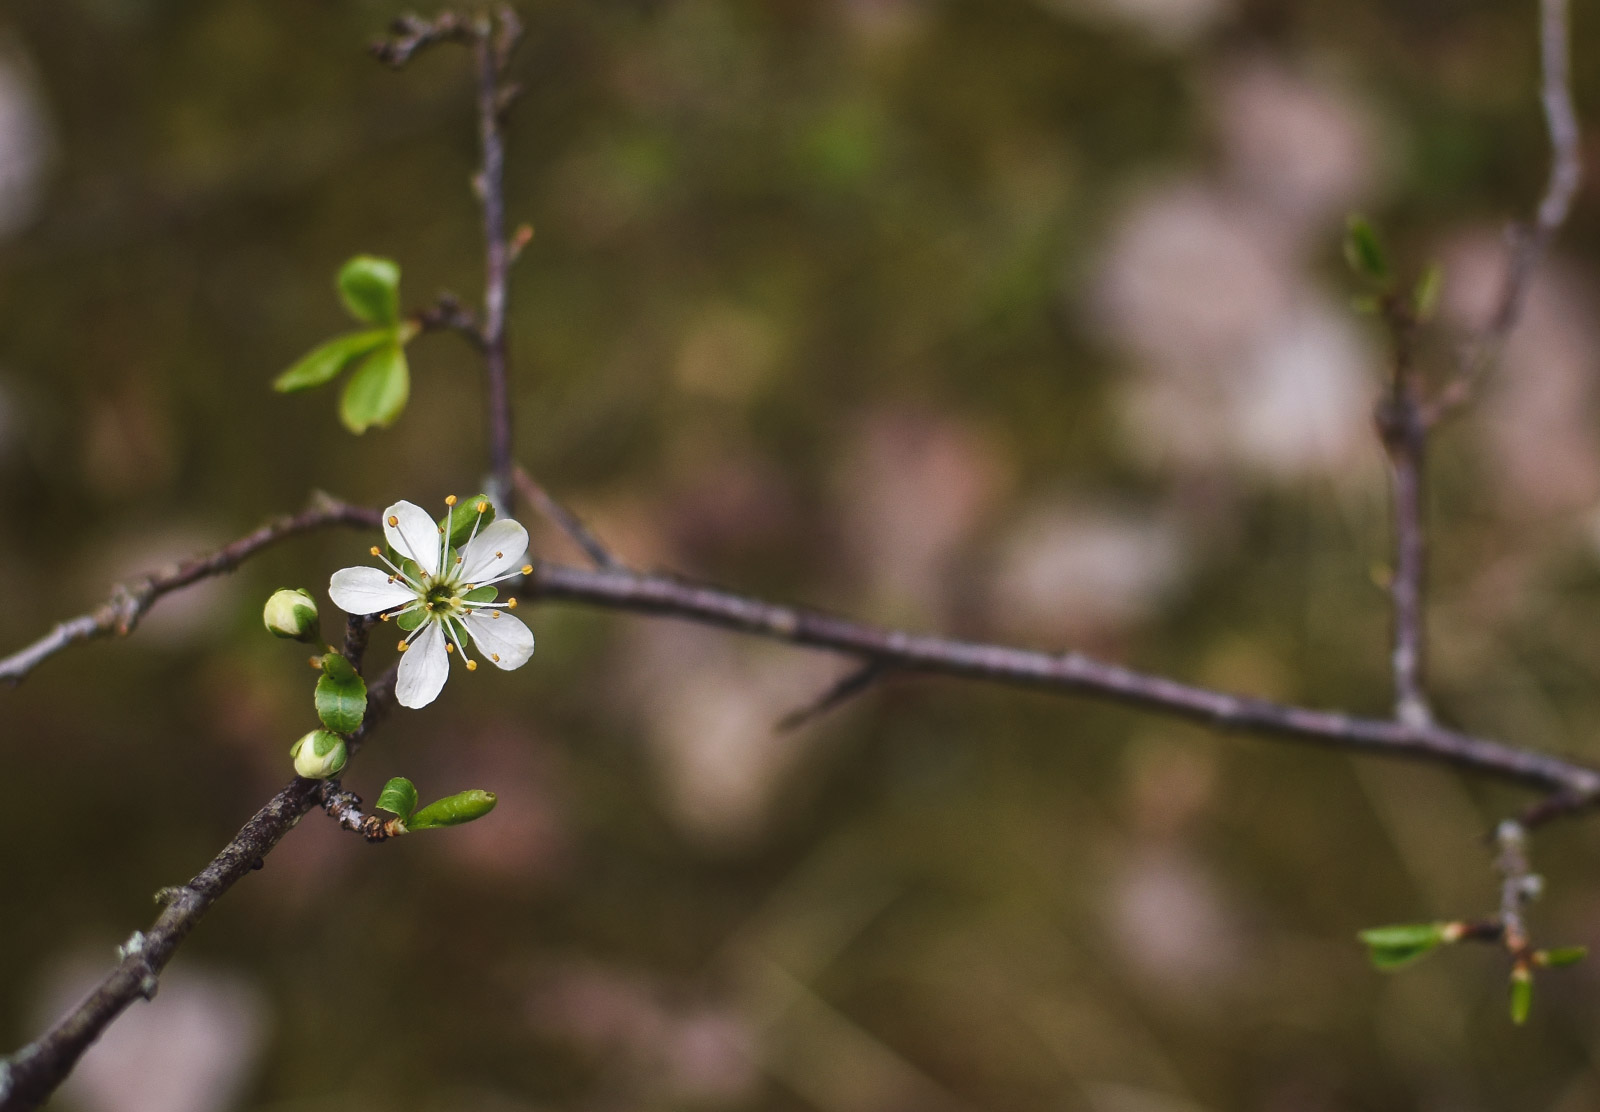 Single flower on branch